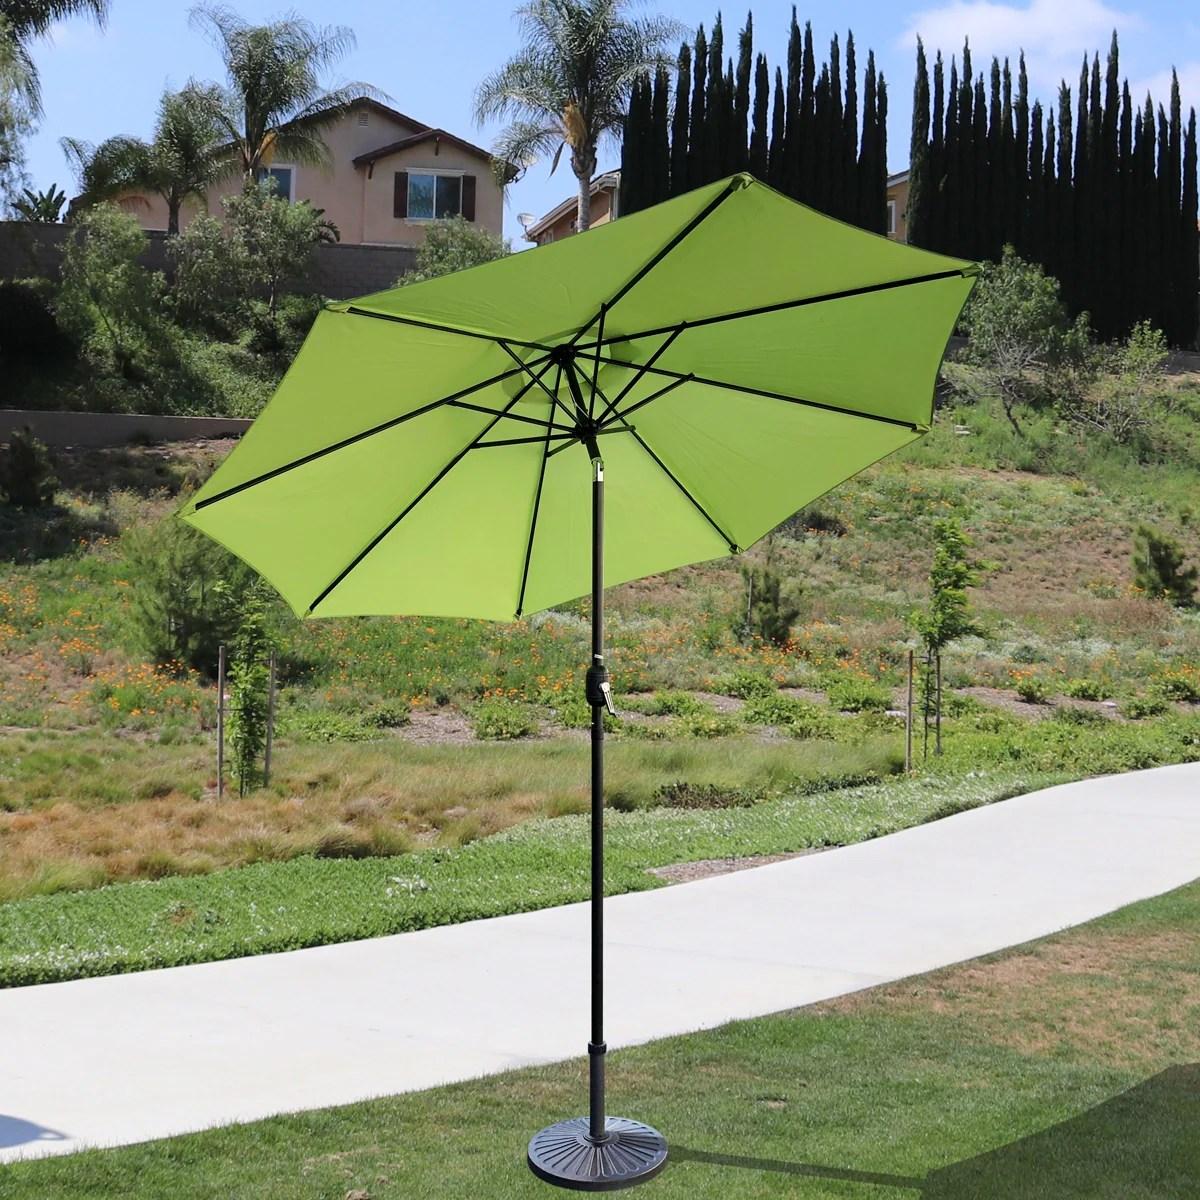 davee furniture 9 round patio umbrella outdoor table umbrella with 8 sturdy ribs green